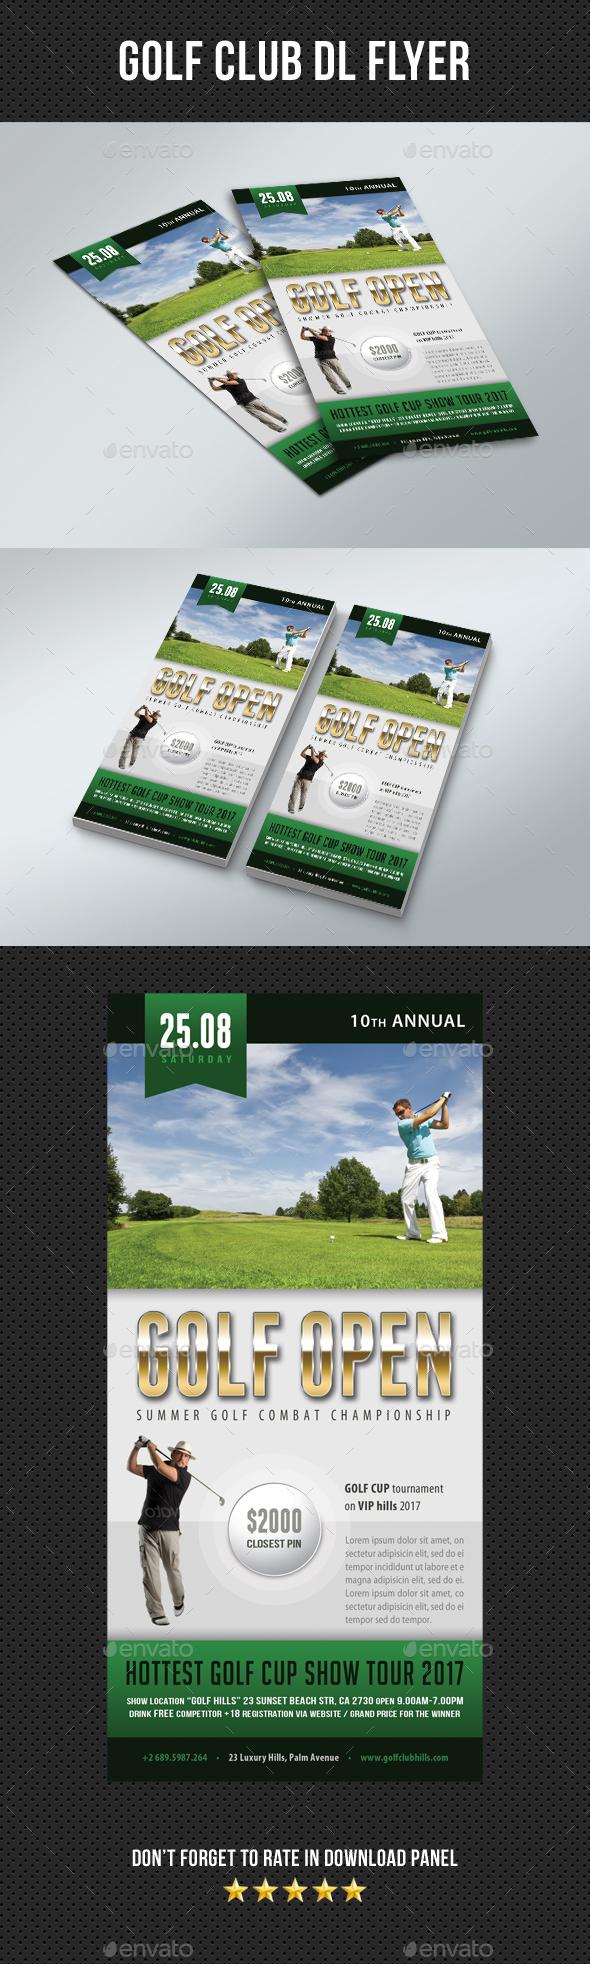 Golf Club DL Flyer 03 - Sports Events